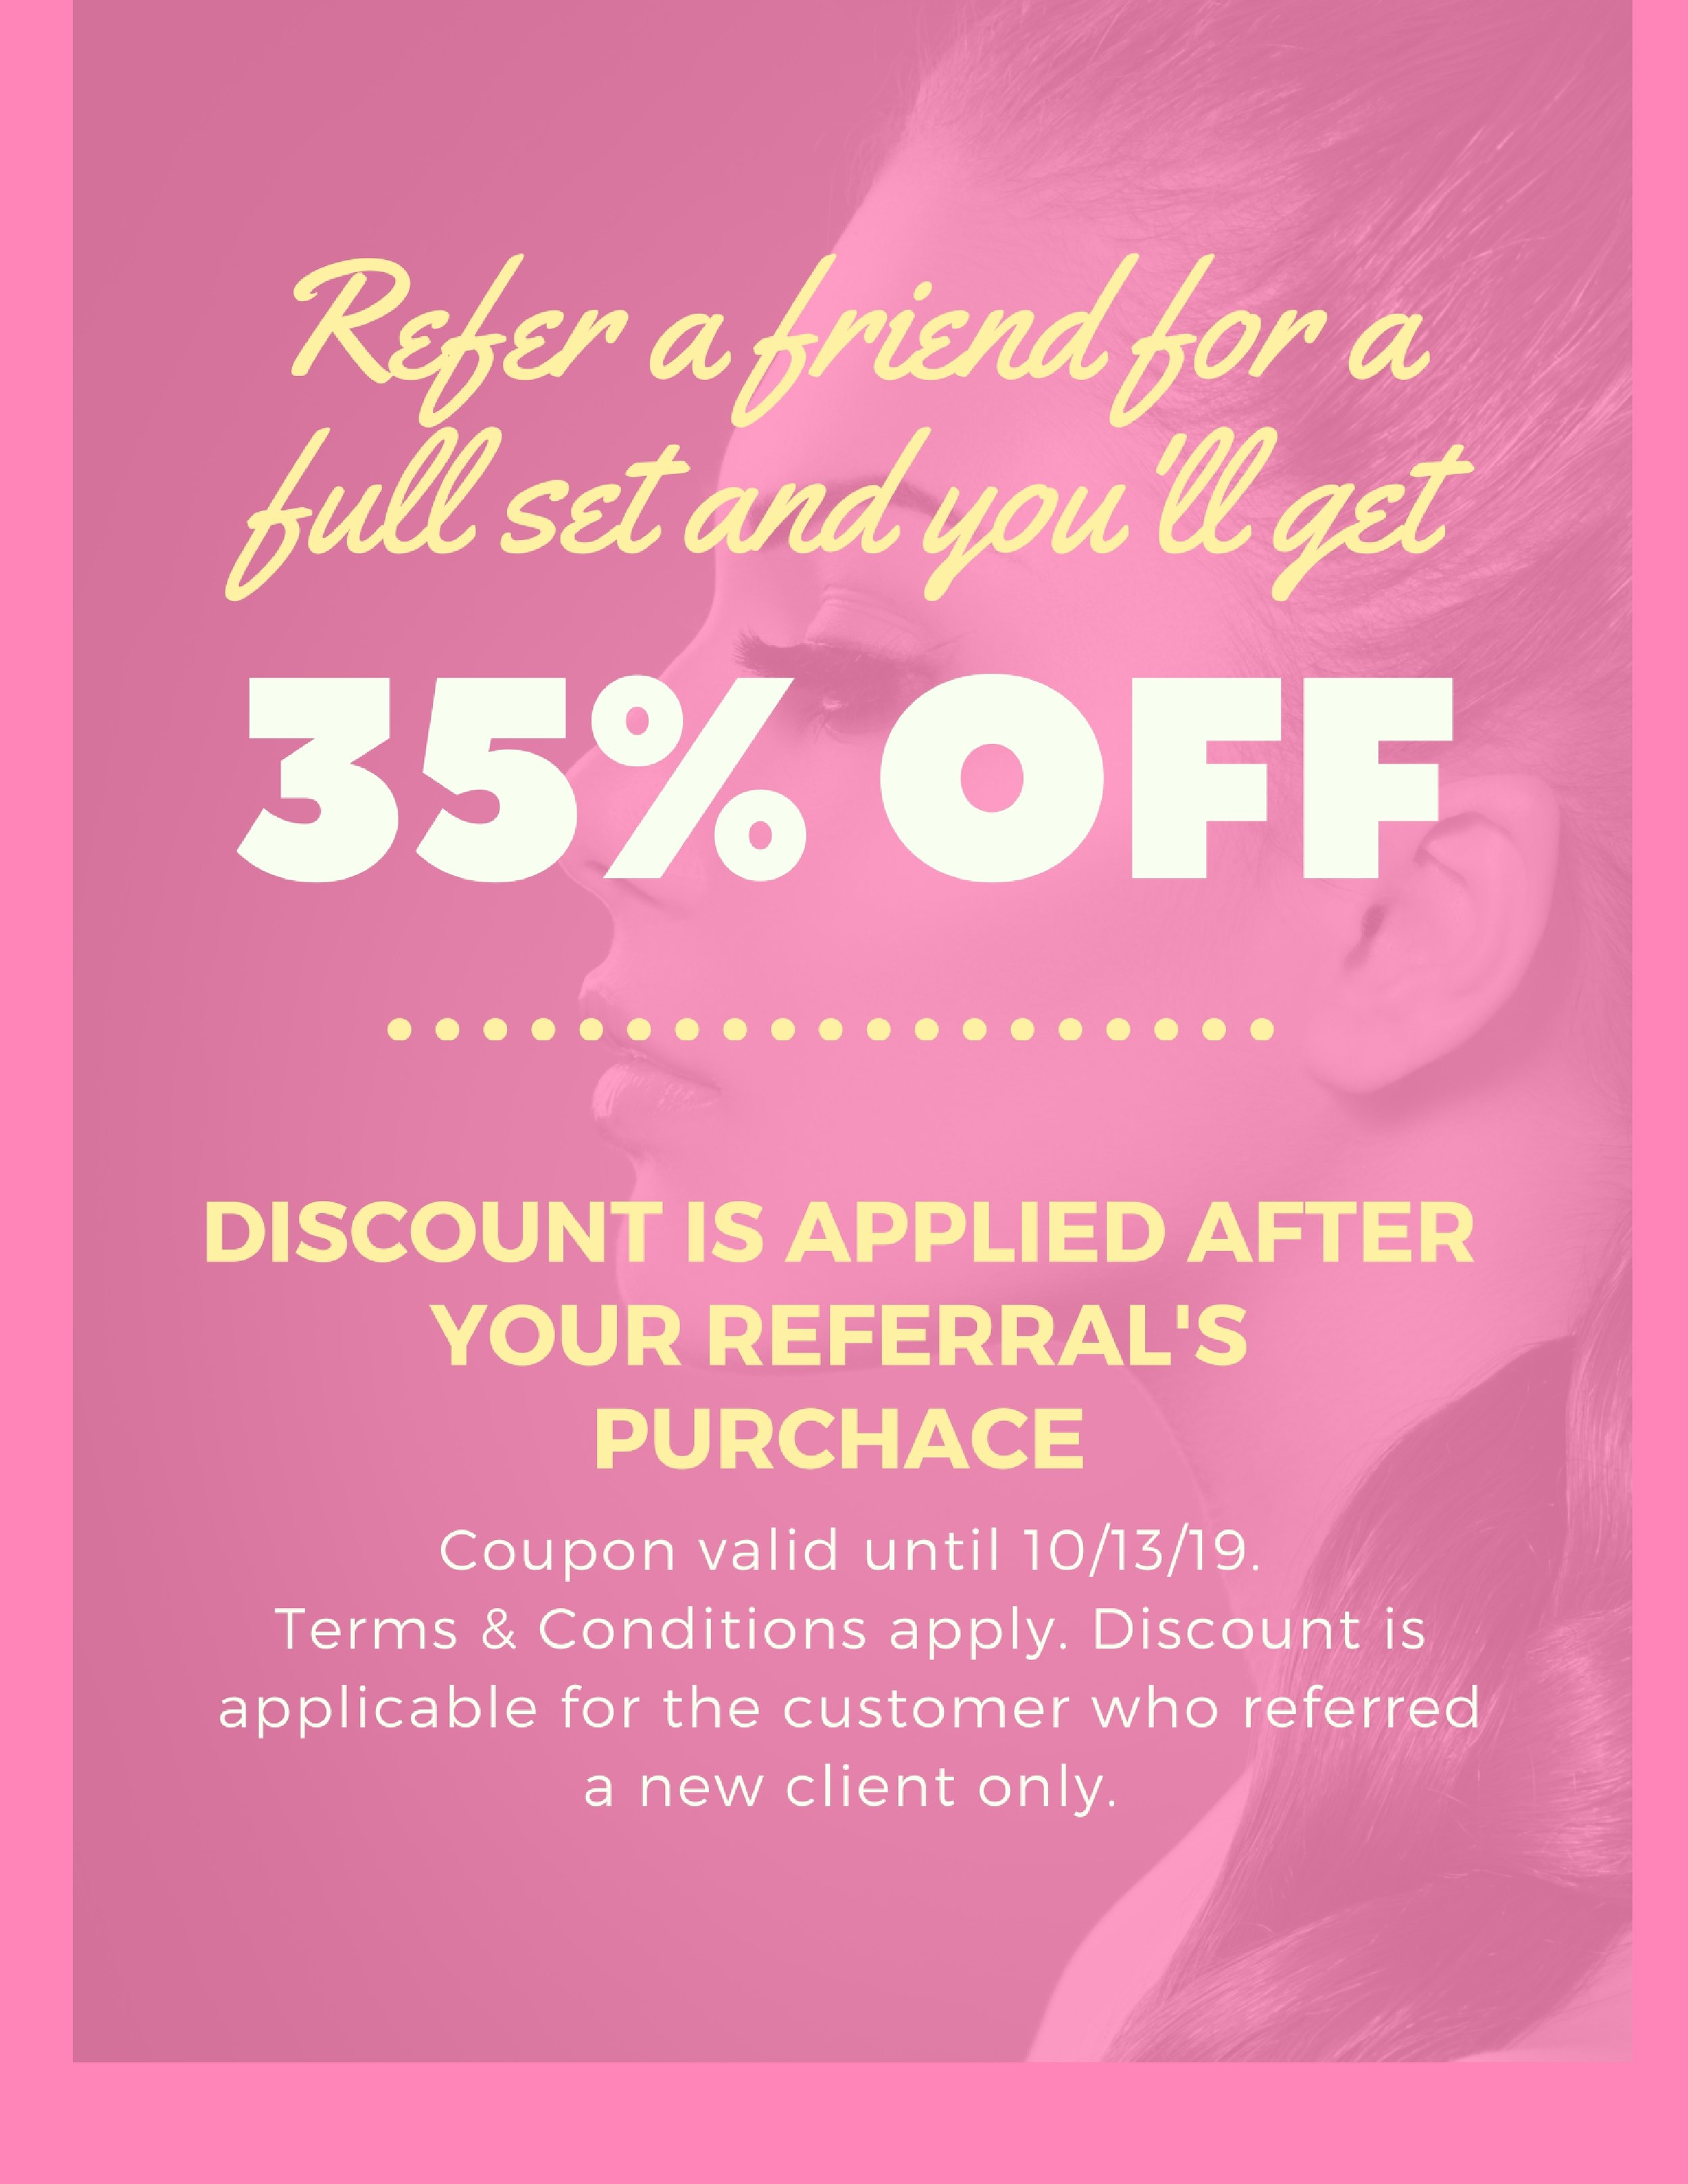 Refer a friend for a full set.jpg